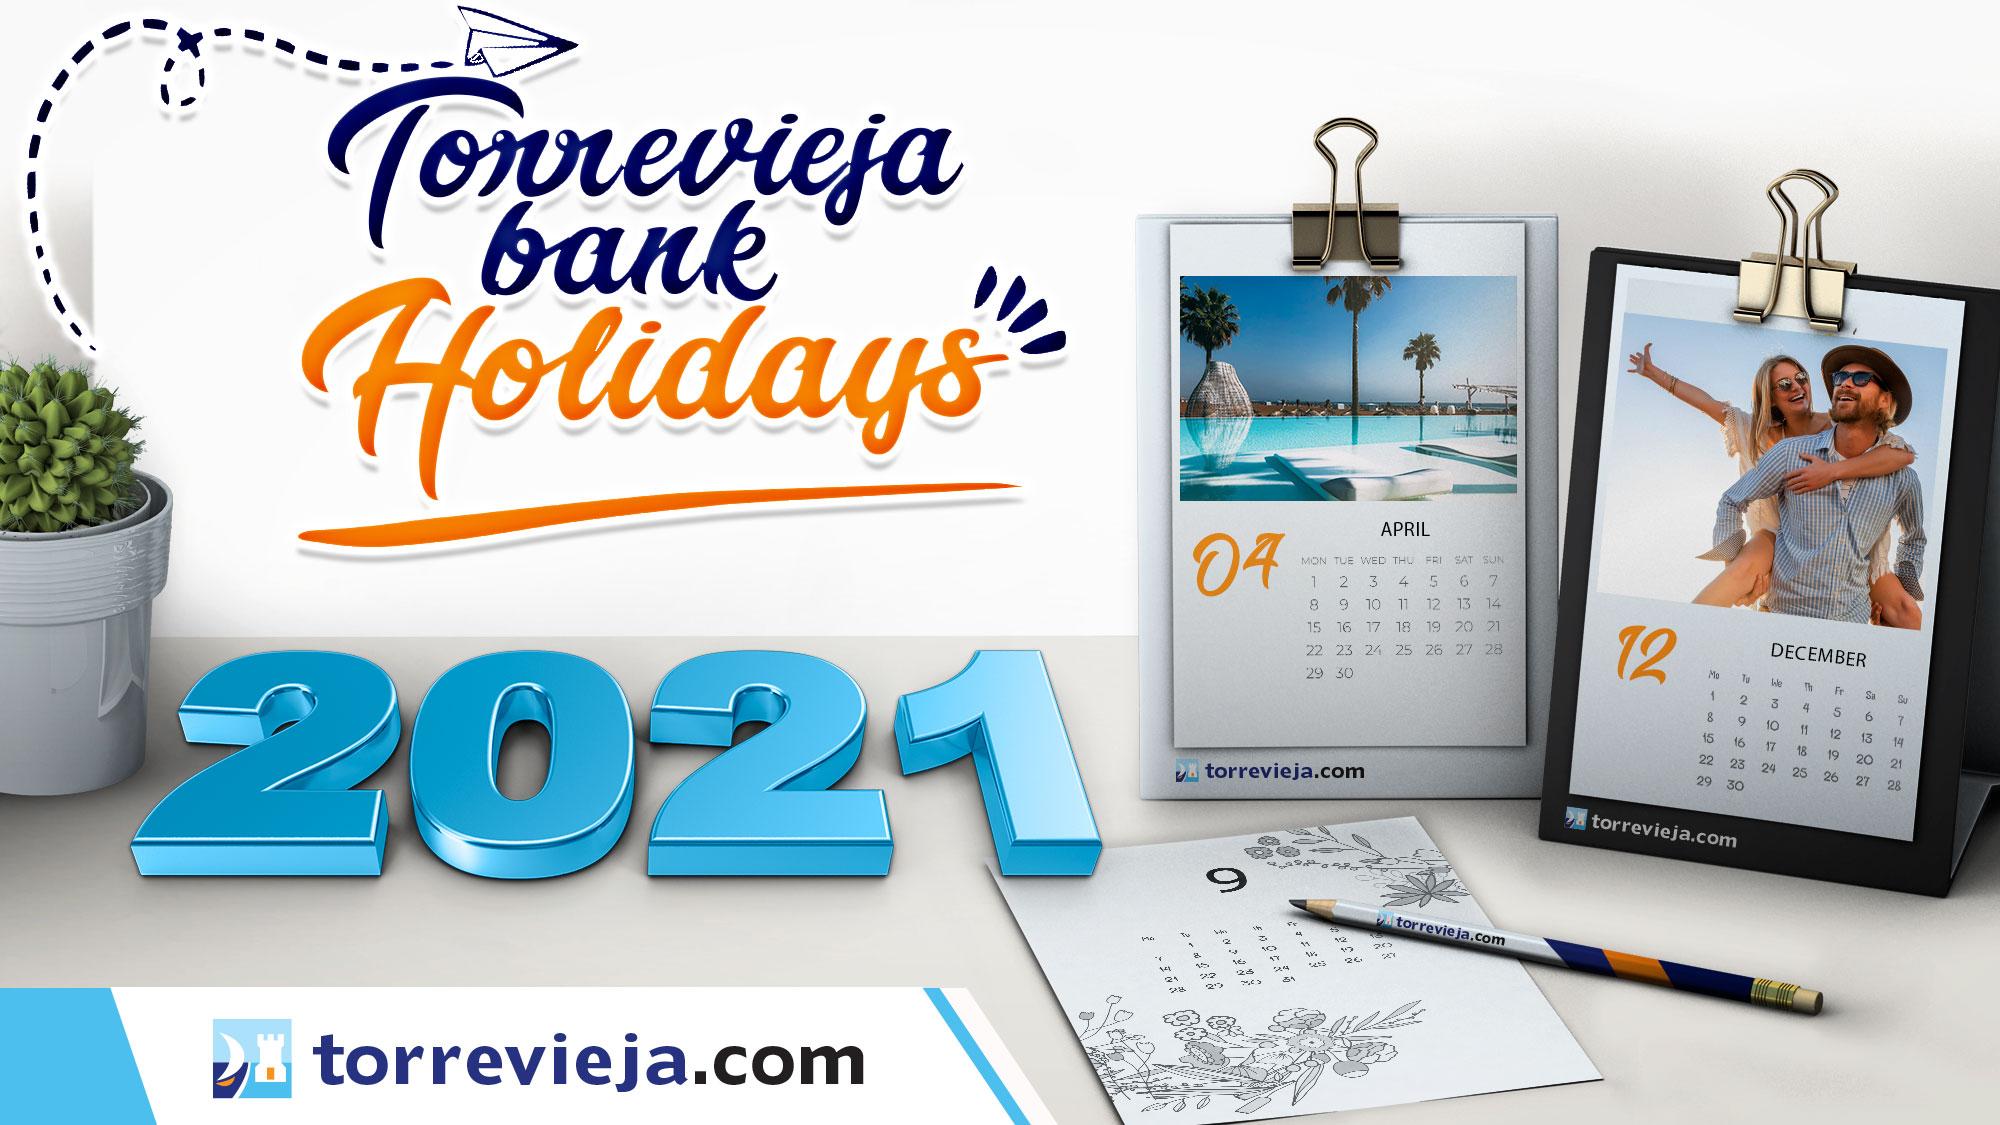 Torrevieja-bank-holidays-2021